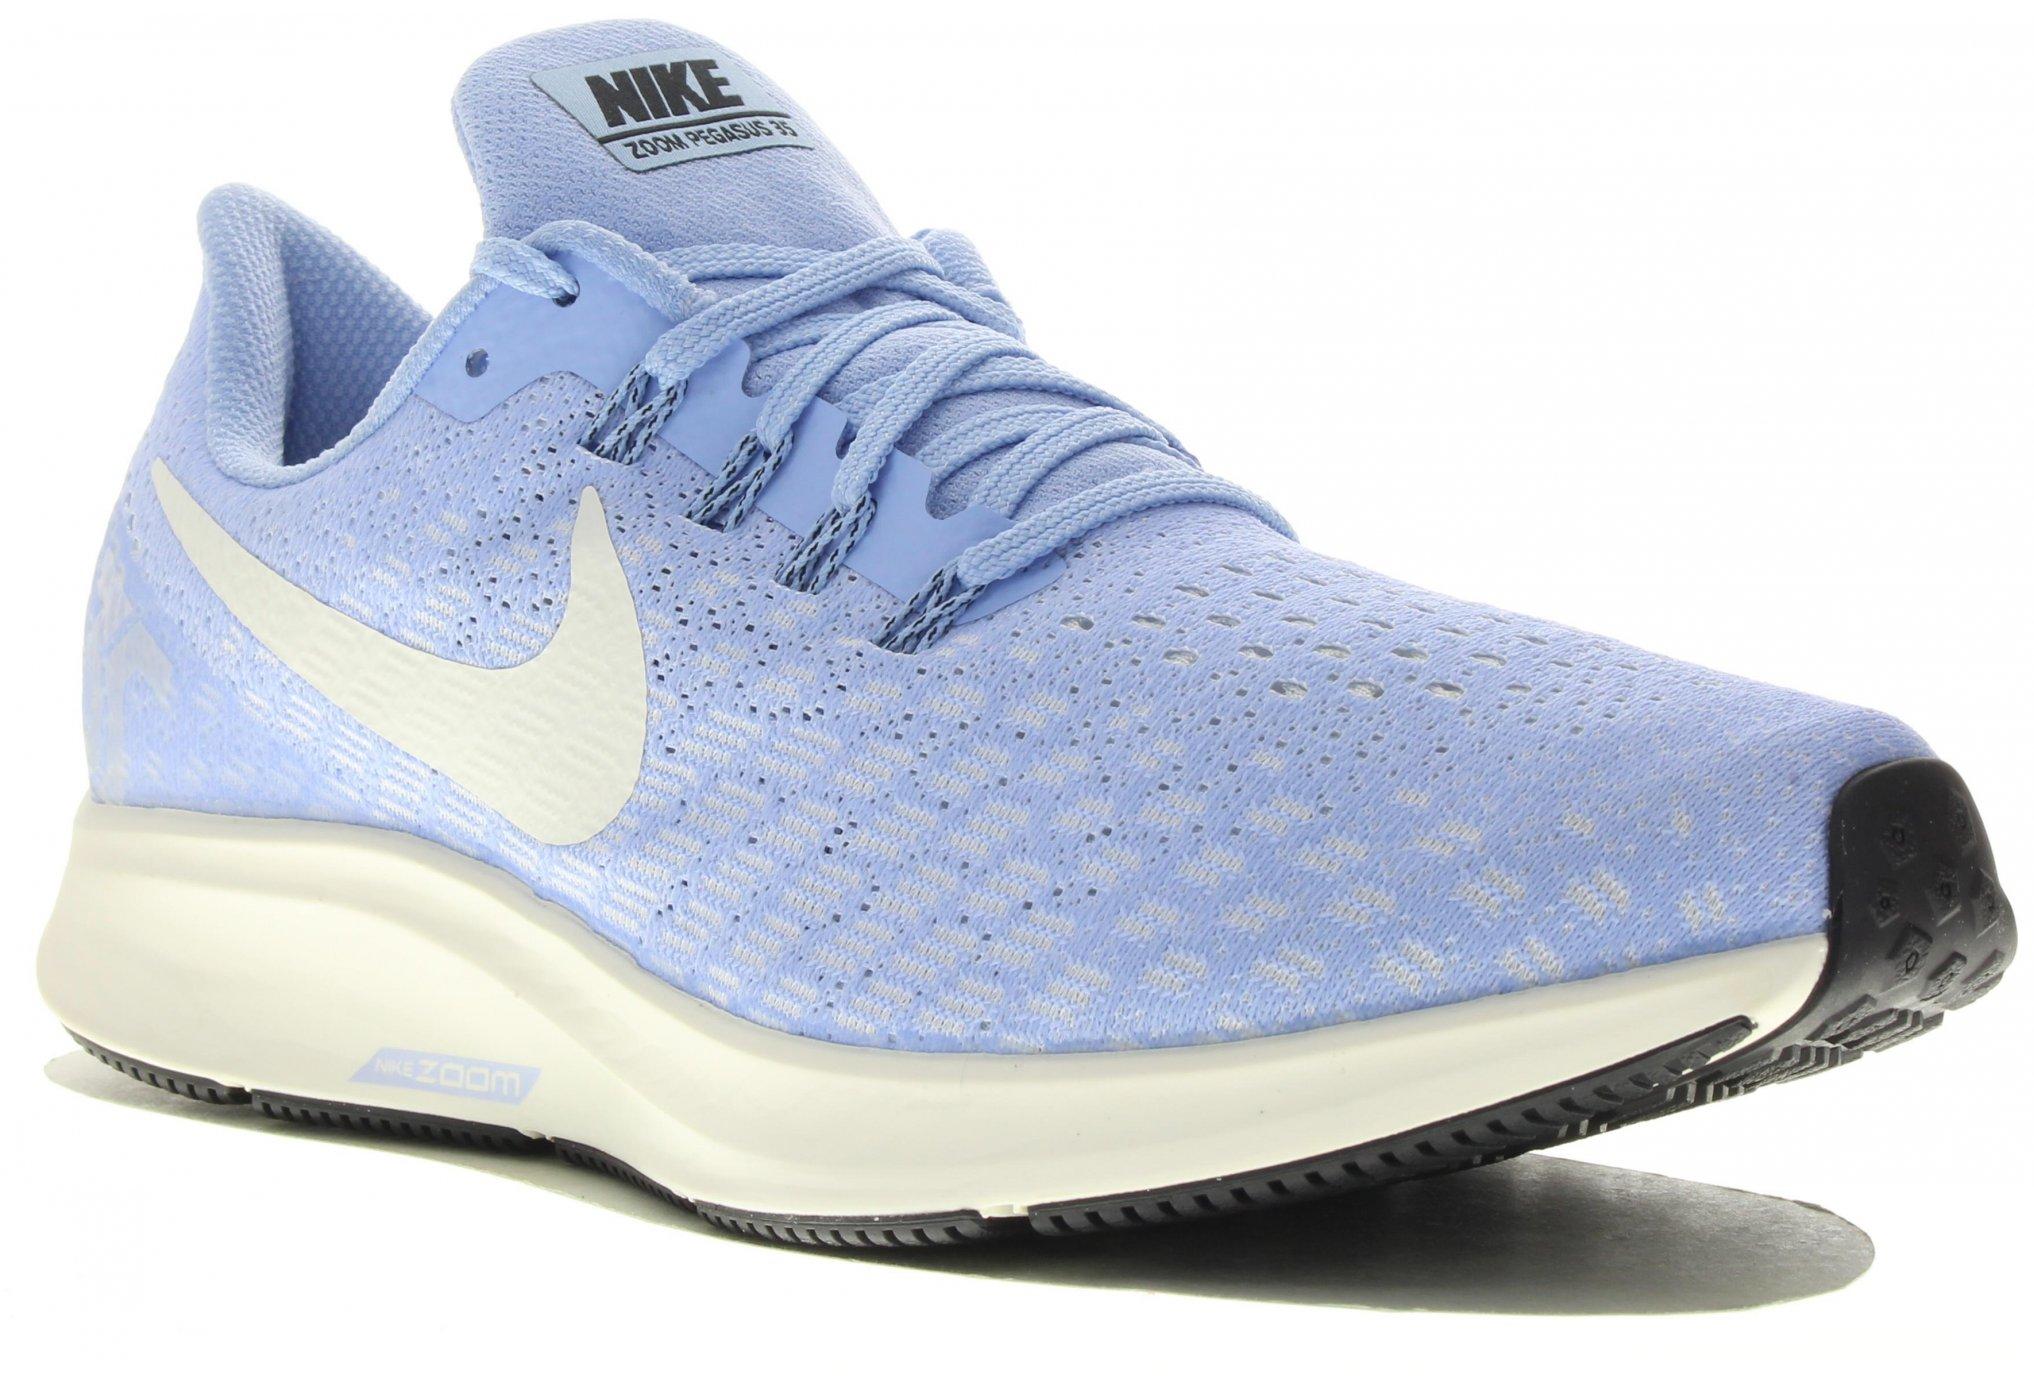 brand new 8dfd3 3c229 Nike Air Zoom Pegasus 35 W Chaussures running femme